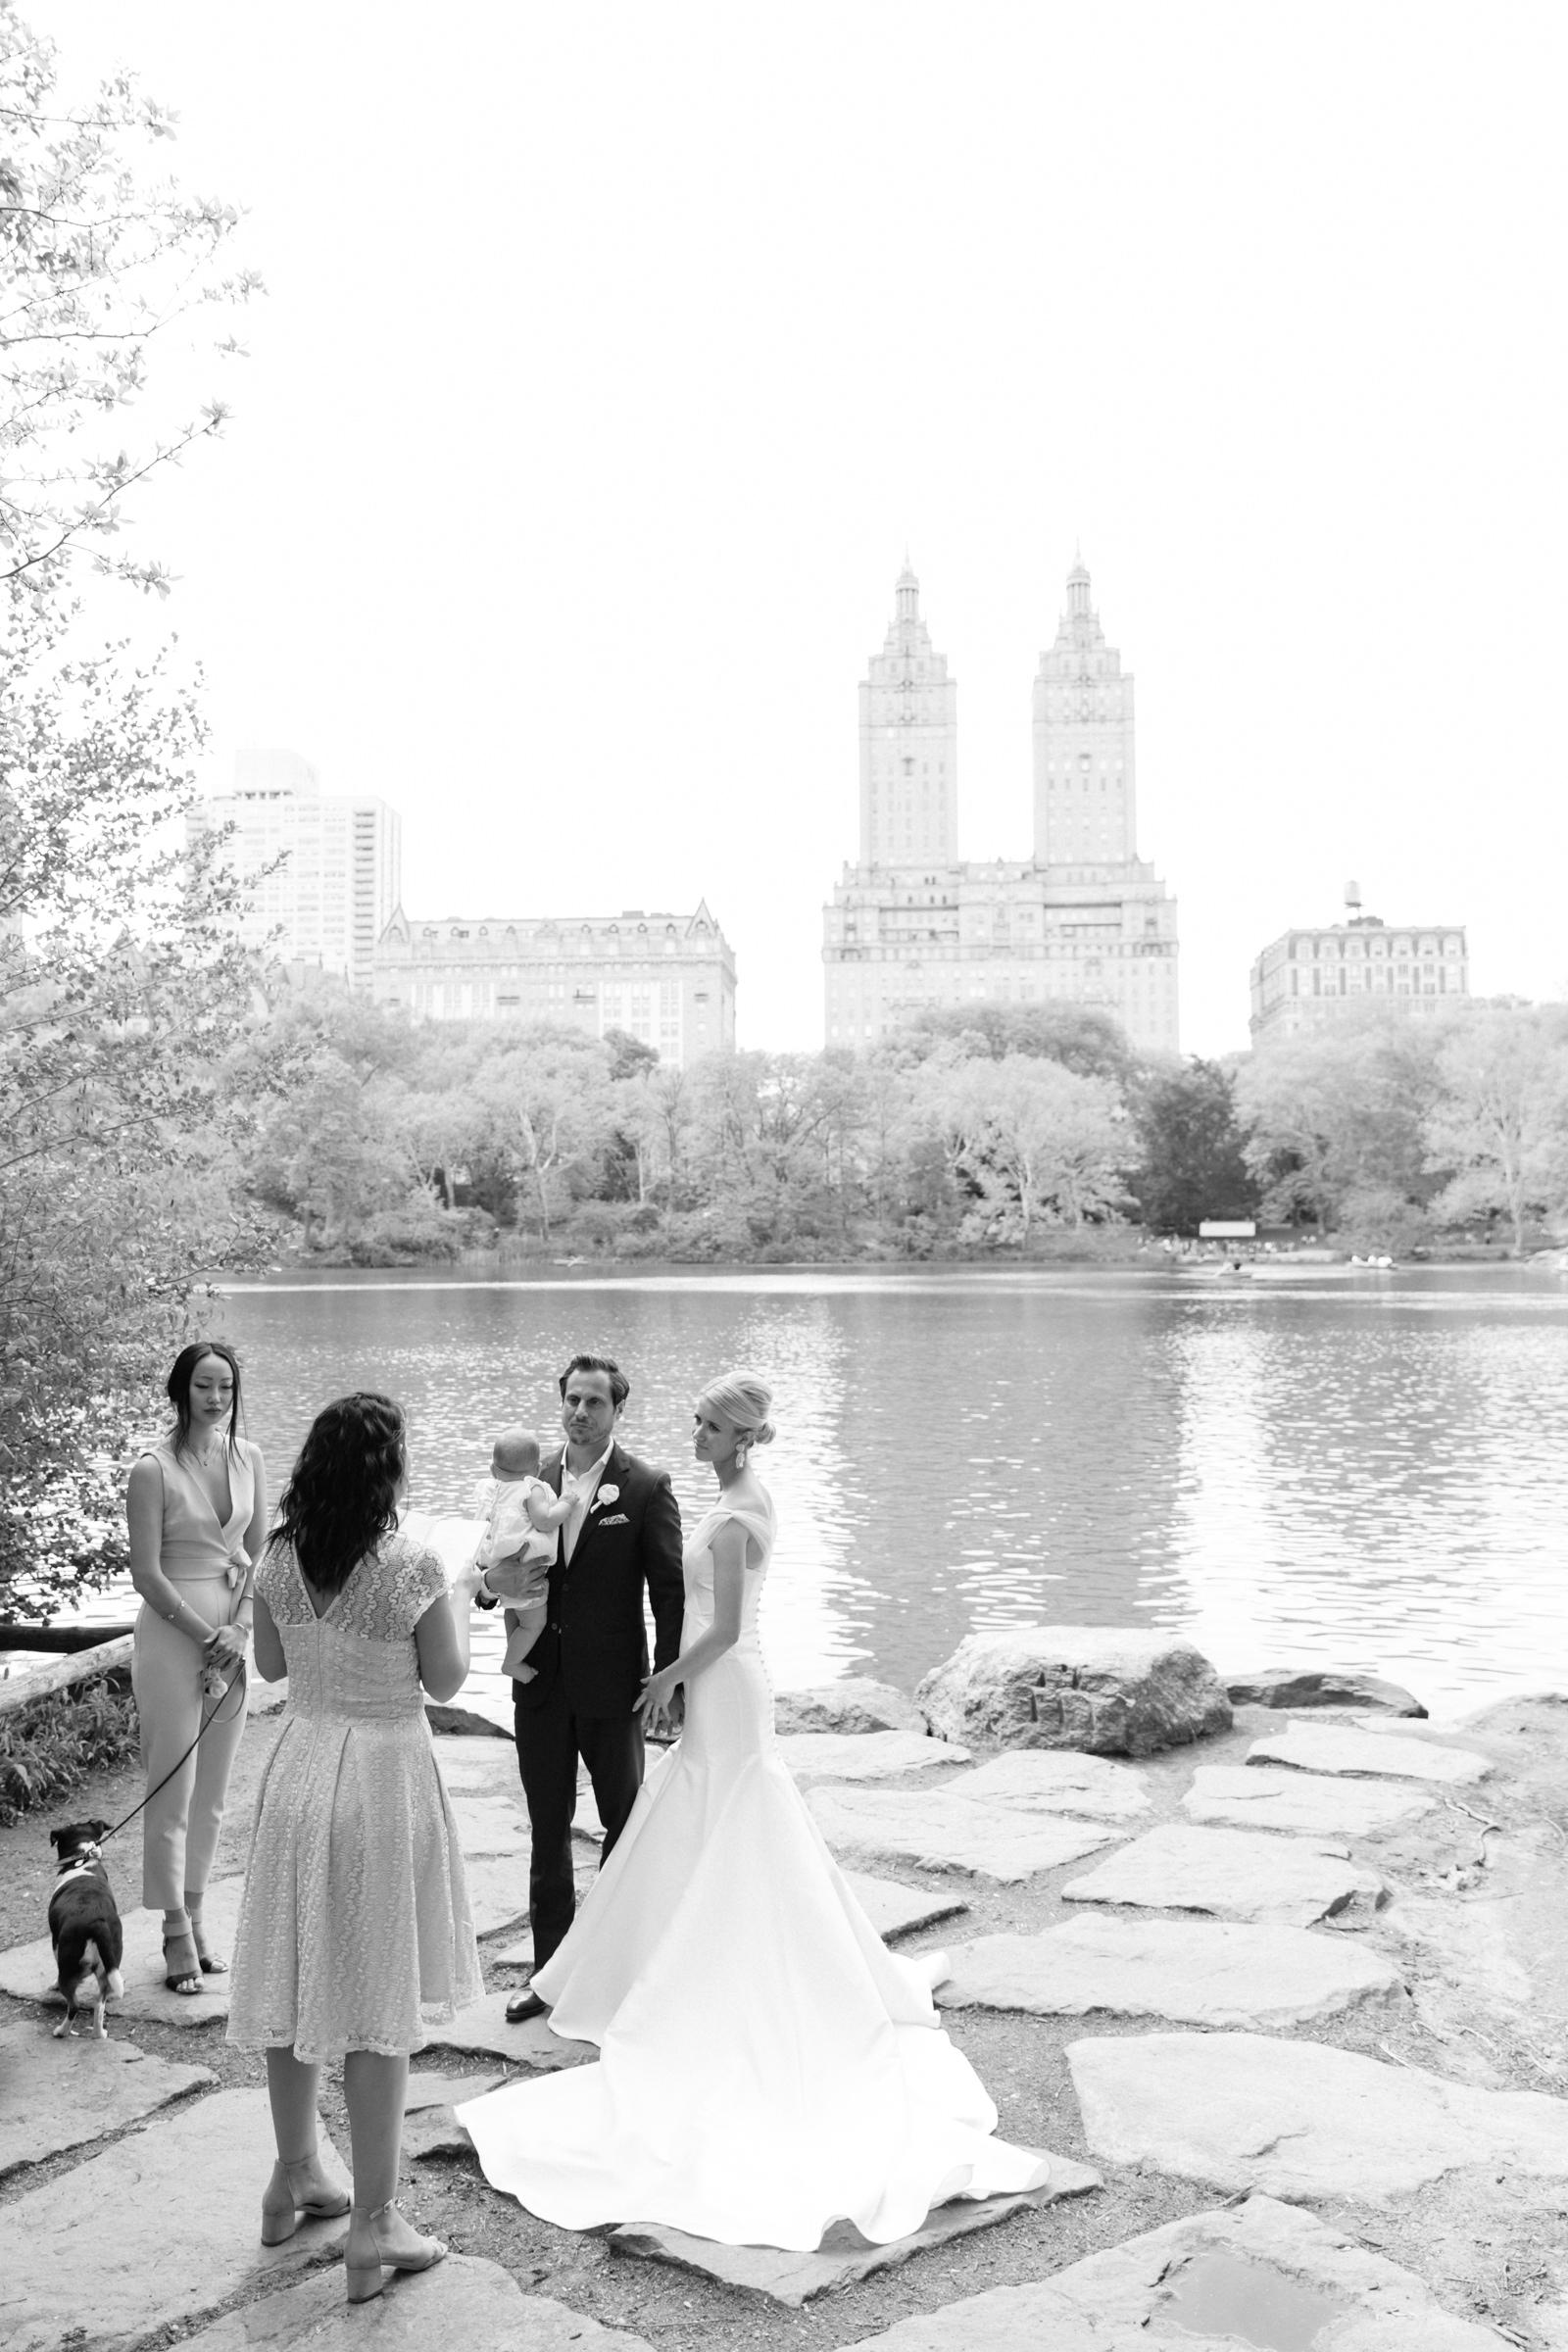 Intimate-NYC_wedding_ by Tanya Isaeva-97.jpg